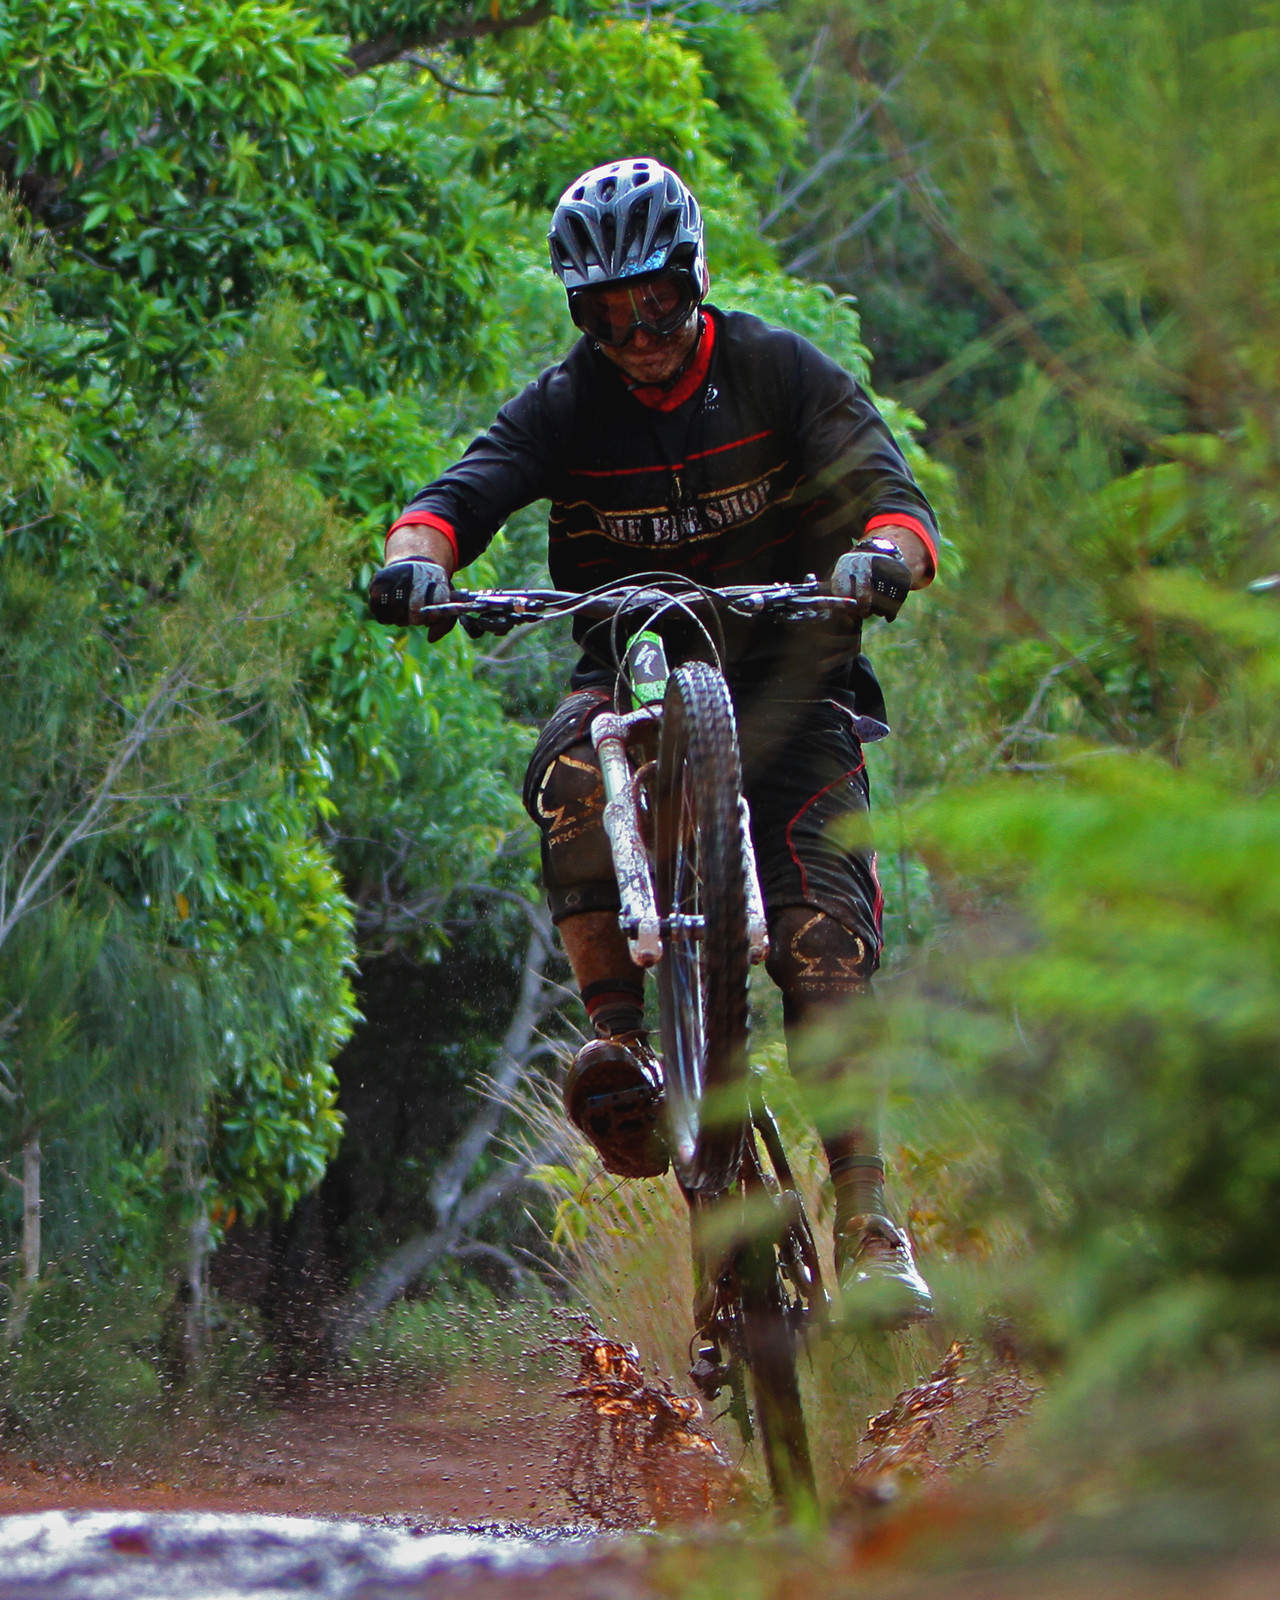 IMG 2983 - thevish - Mountain Biking Pictures - Vital MTB